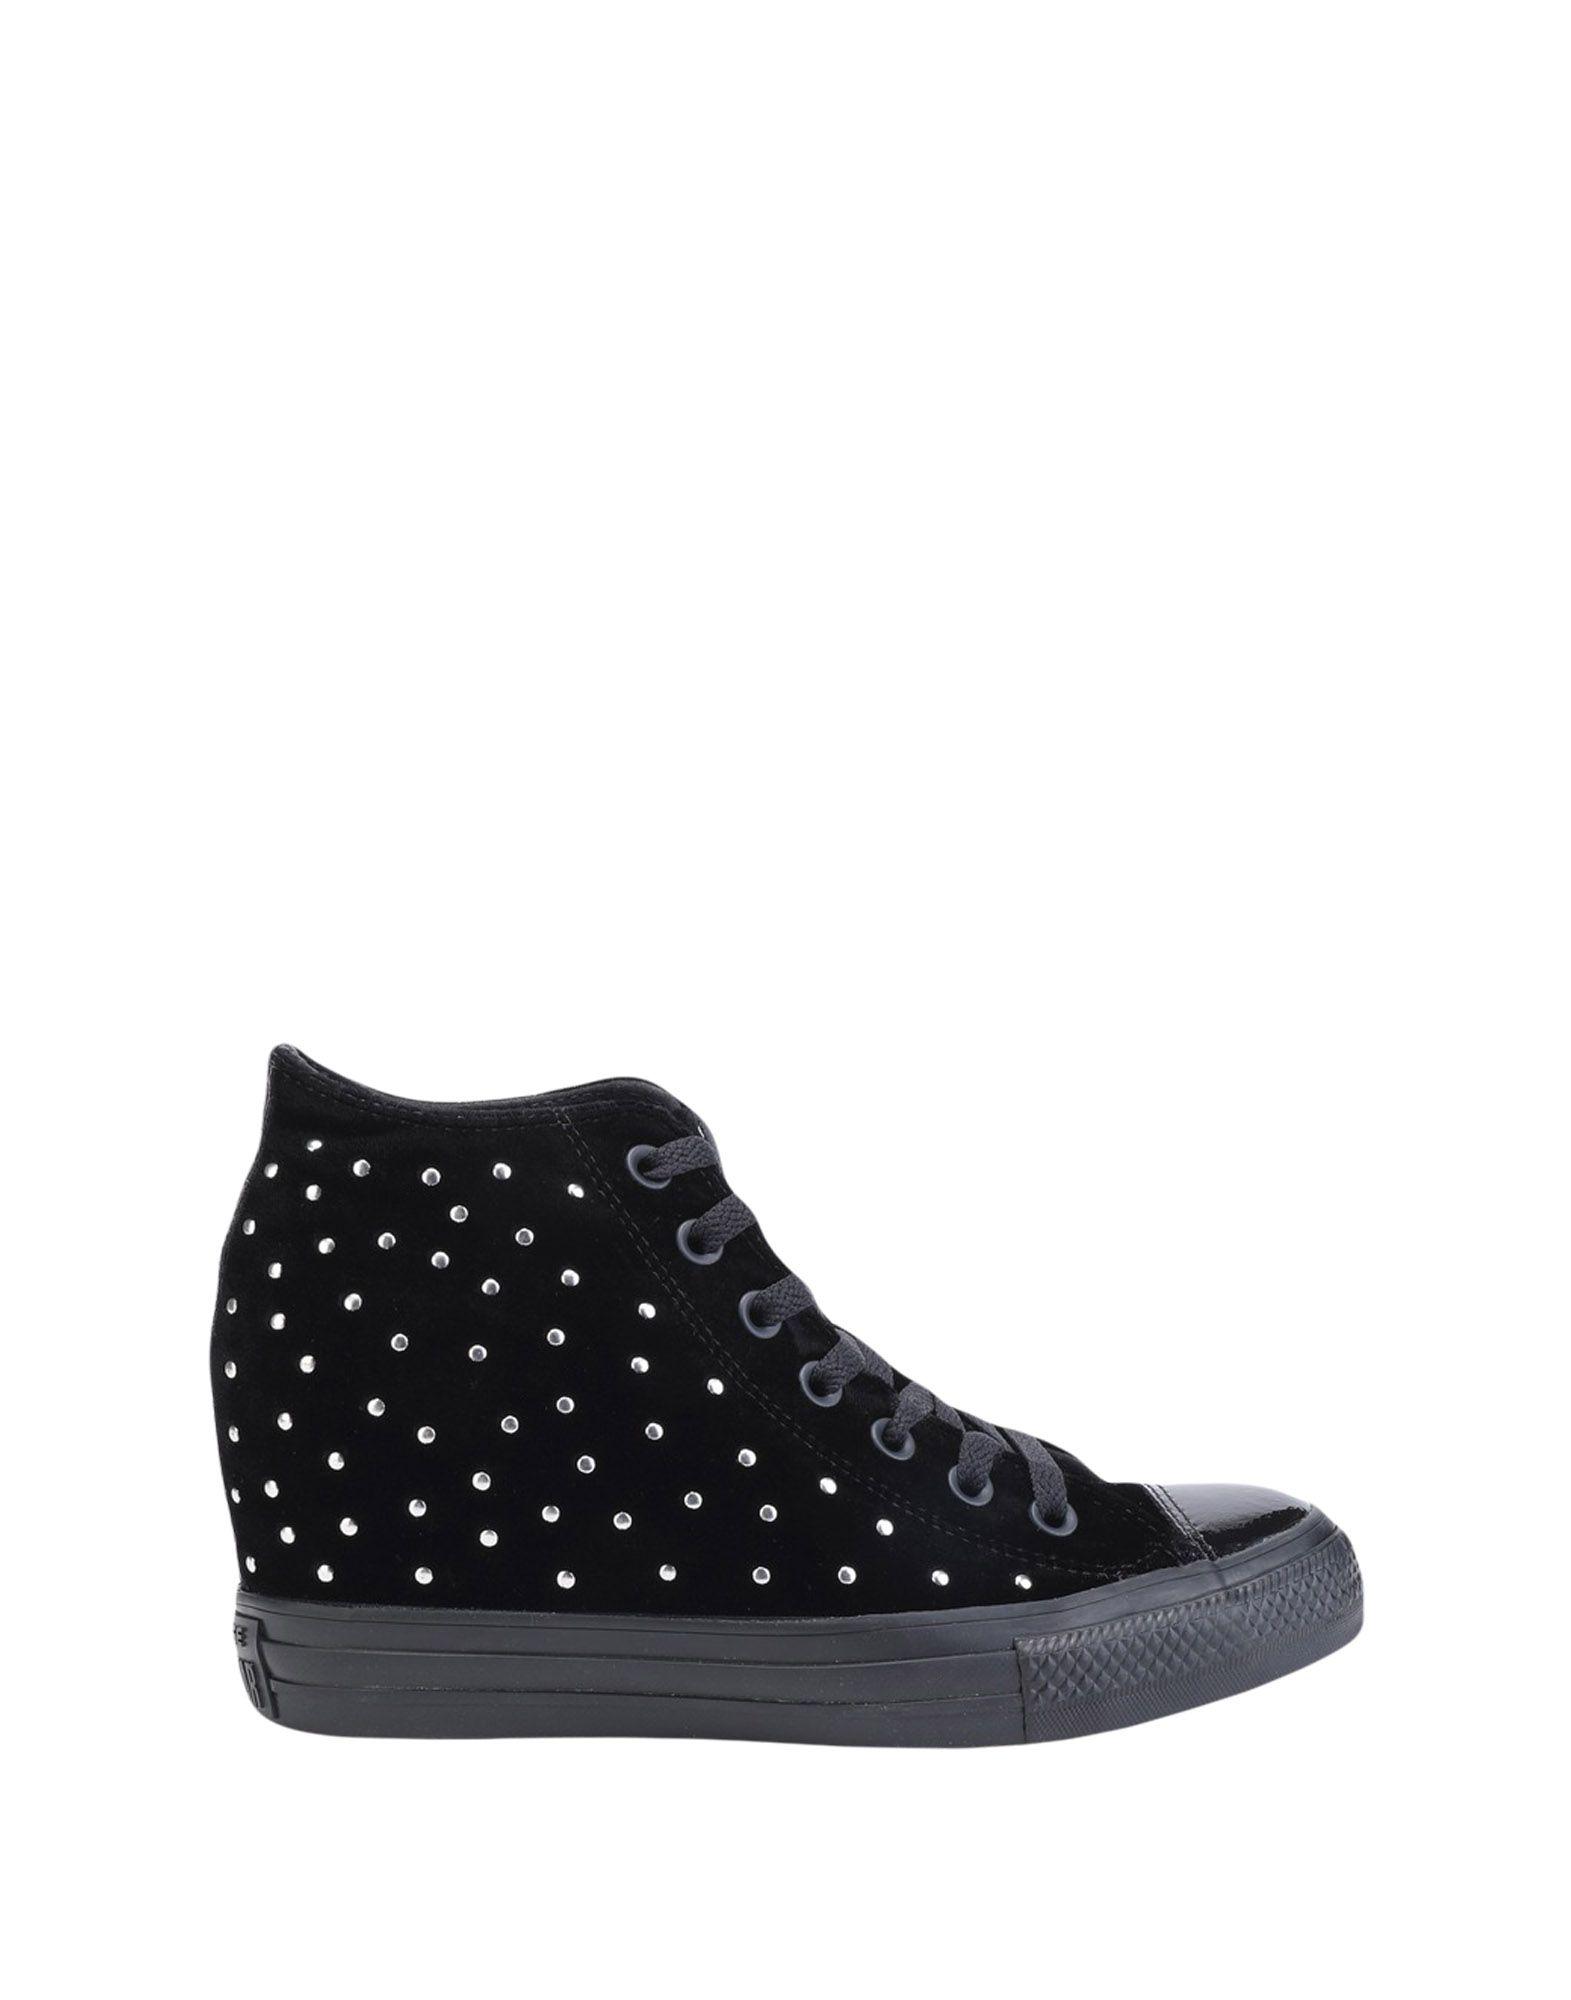 Converse All Star Ct As Mid Lux Velvet Studs  11356638OW Gute Qualität beliebte Schuhe